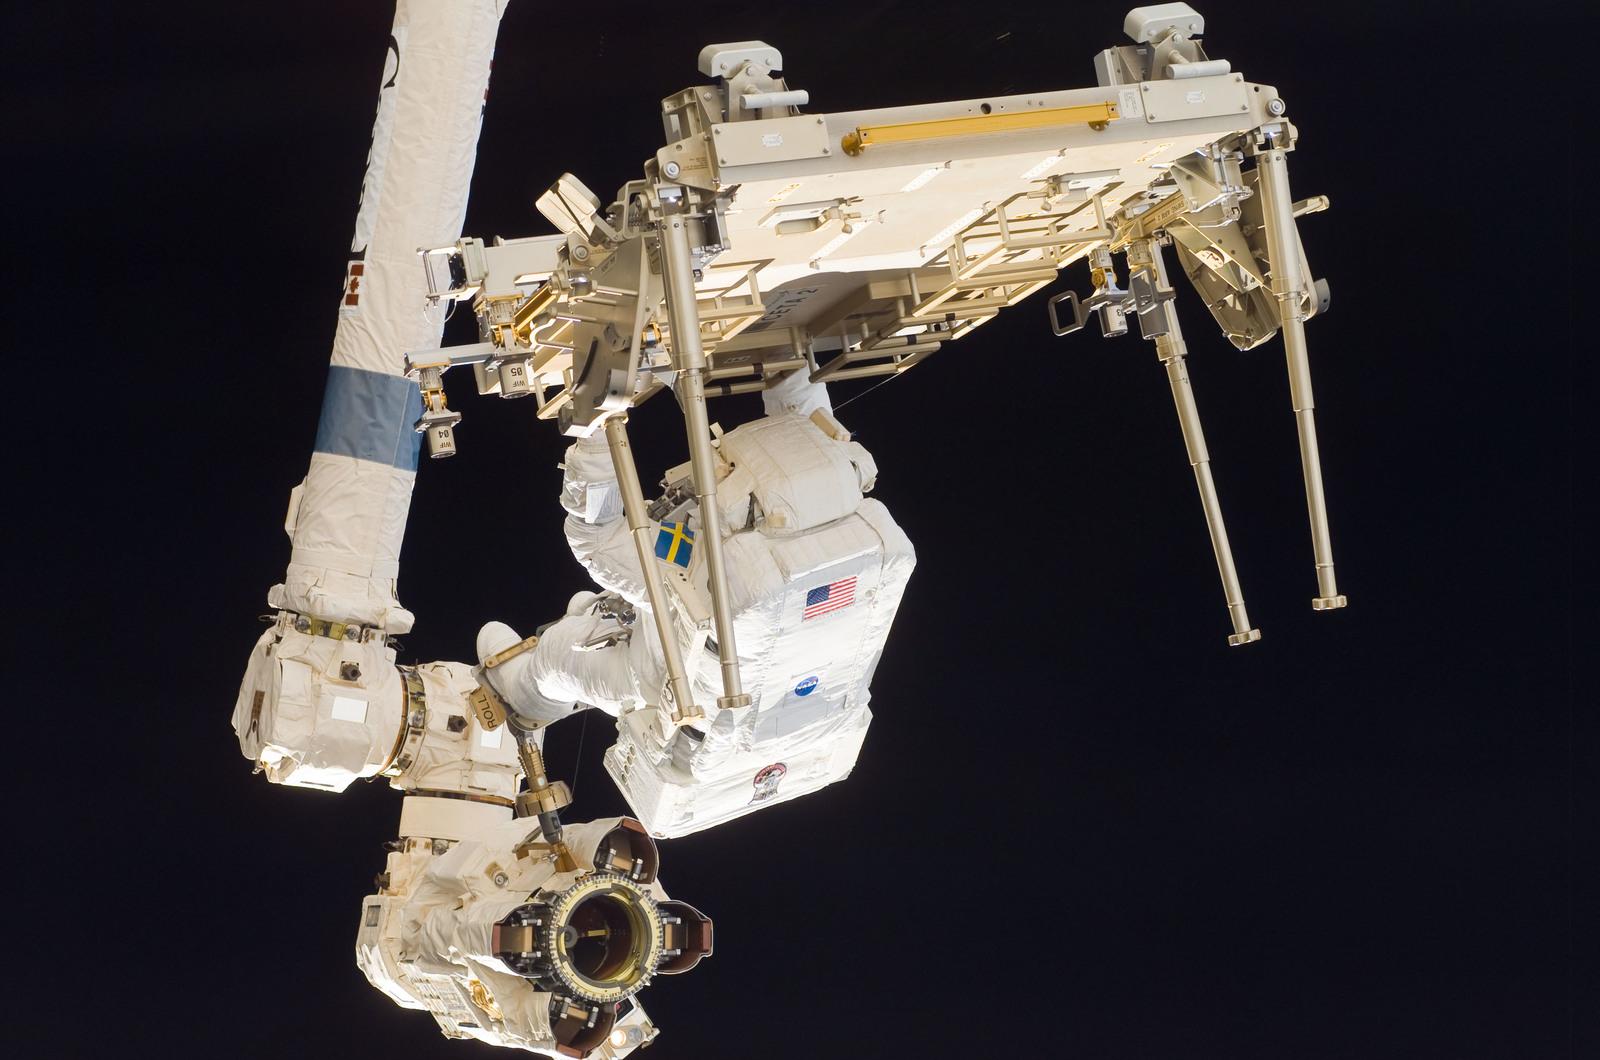 S116E06279 - STS-116 - STS-116 MS Fuglesang relocates CETA 2 cart on EVA 2